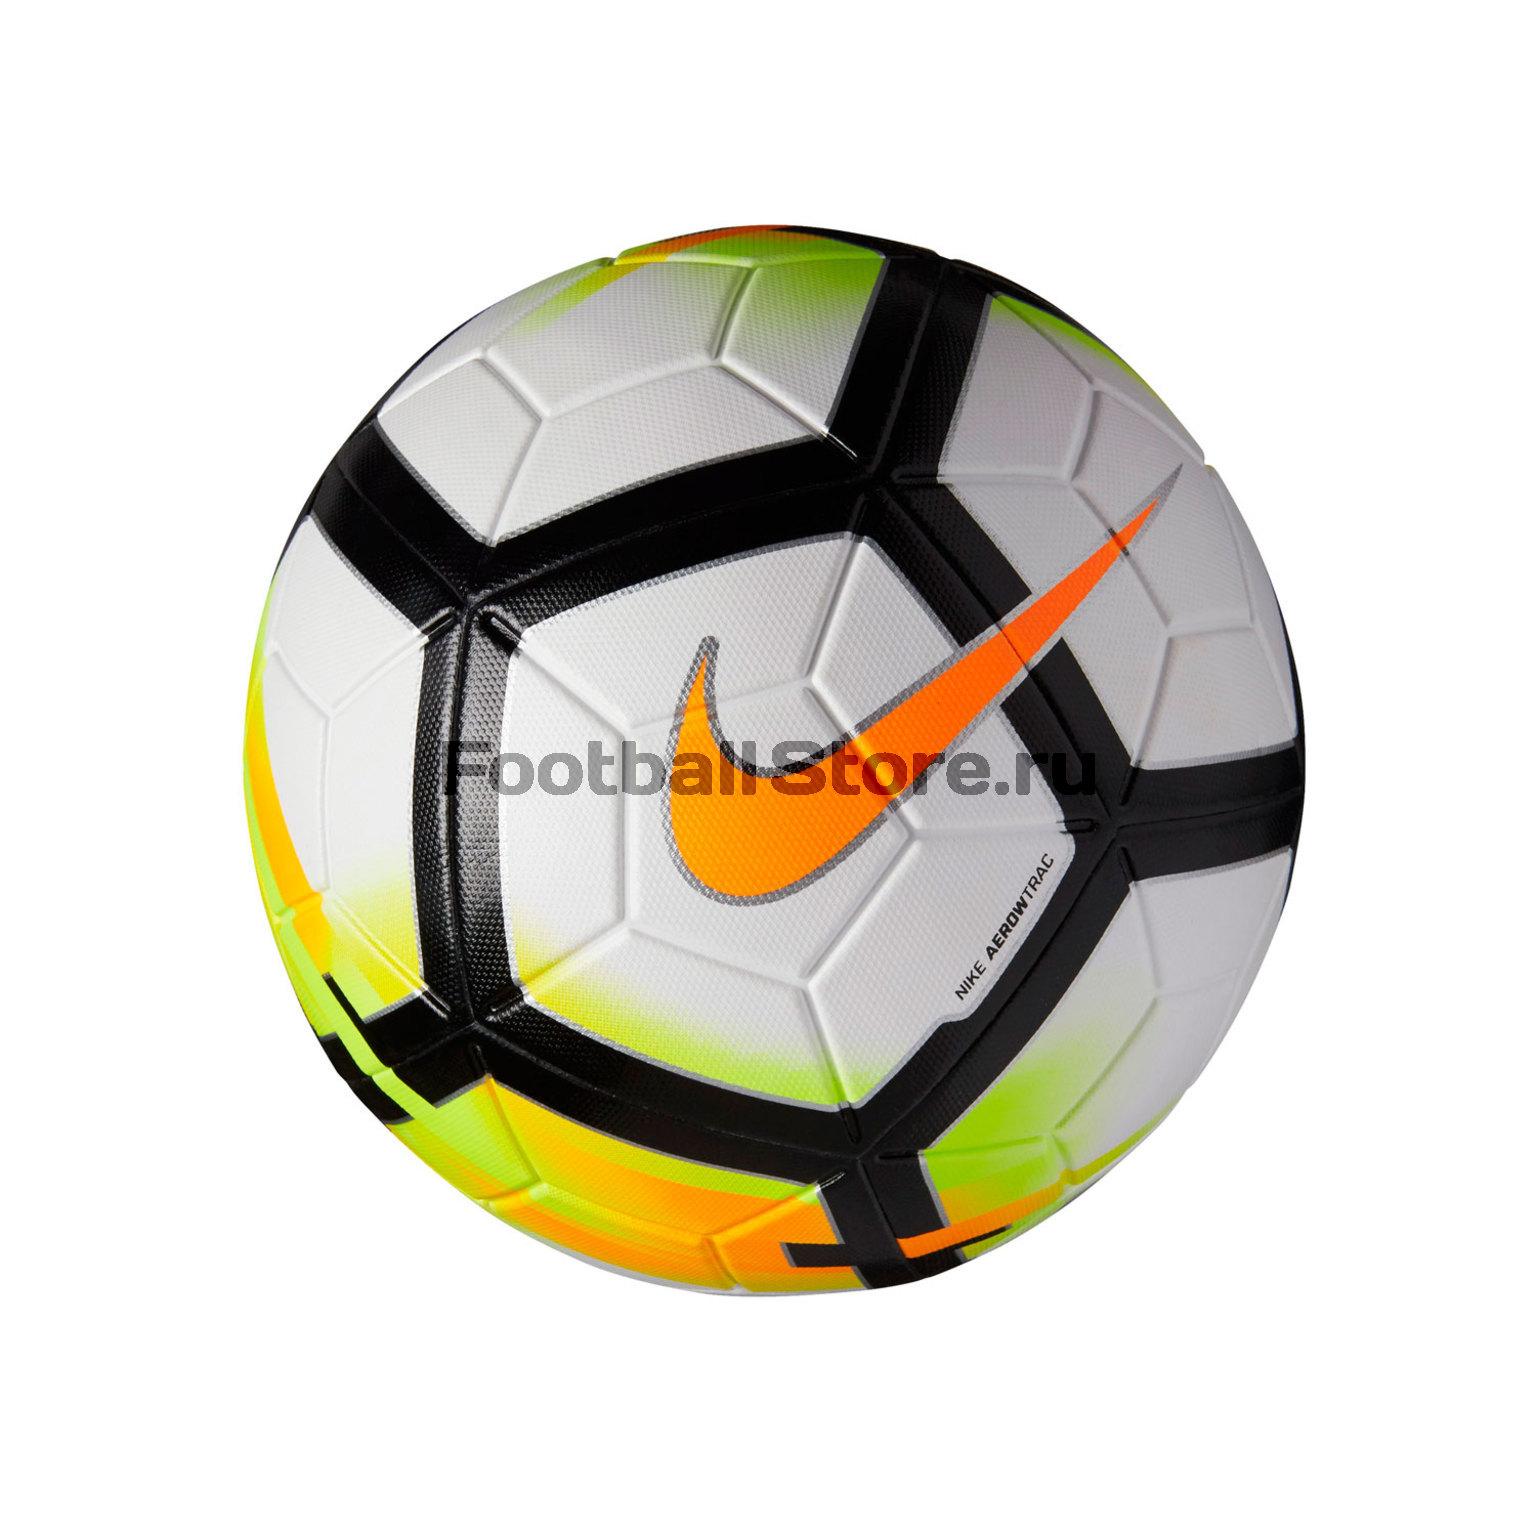 Классические Nike Мяч Nike Magia Football SC3154-100 мяч футбольный nike magia sc3154 100 р 5 fifa quality pro fifa appr